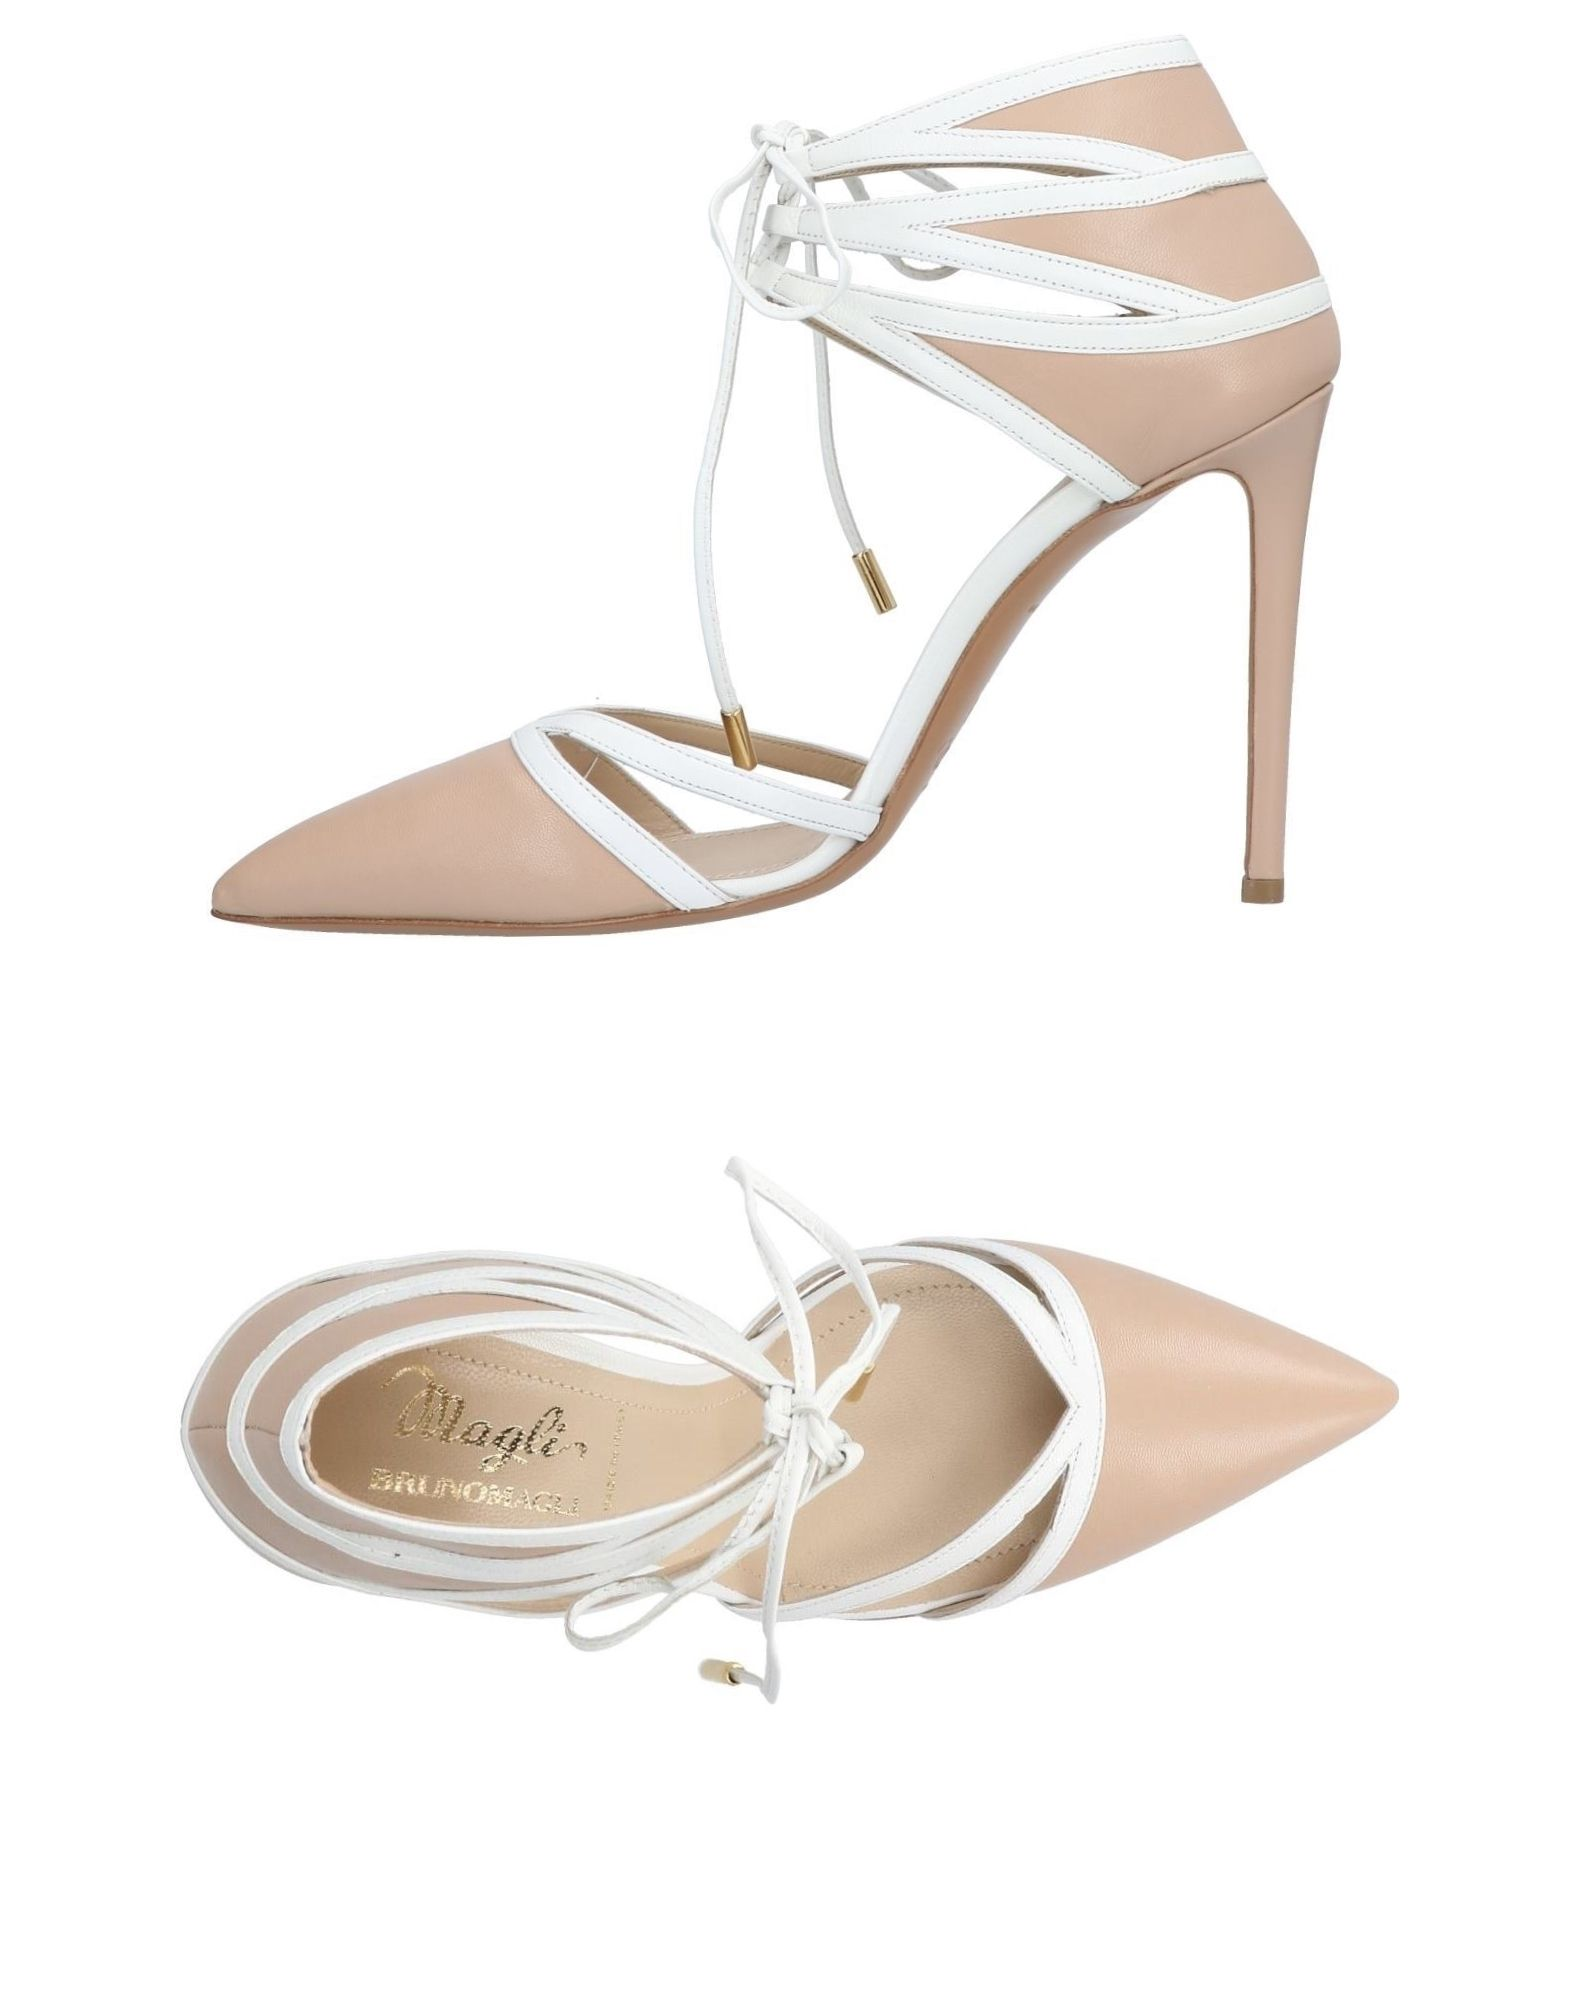 Magli By Bruno Magli Pumps Damen  11430526WX Gute Qualität beliebte Schuhe